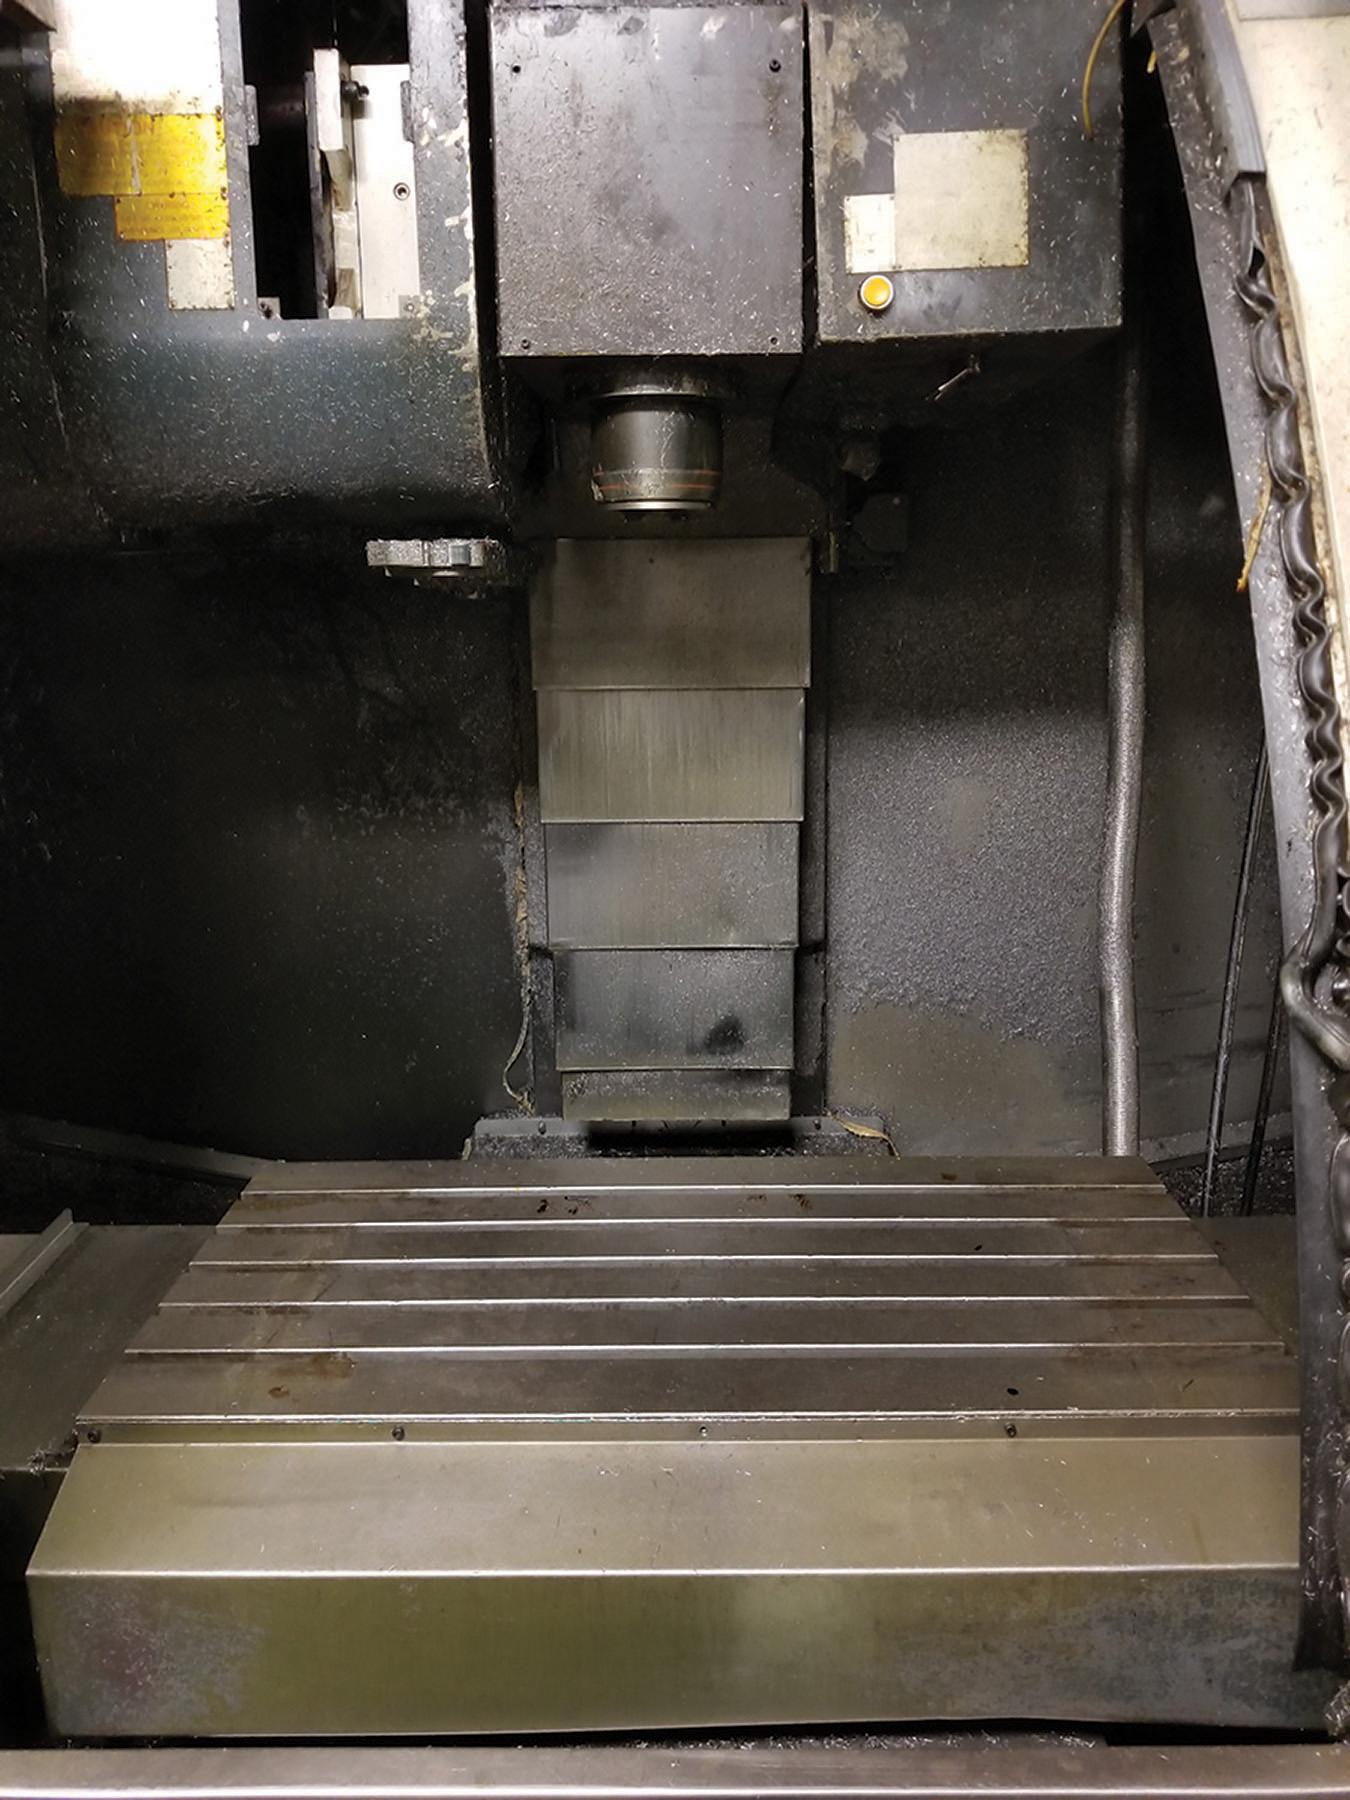 Lot 32 - 2003 JOHNFORD SUPER VERTICAL SV-32 VERTICAL MACHINING CENTER, 4-AXIS, S/N MB2302, 17.5'' X 39.25''